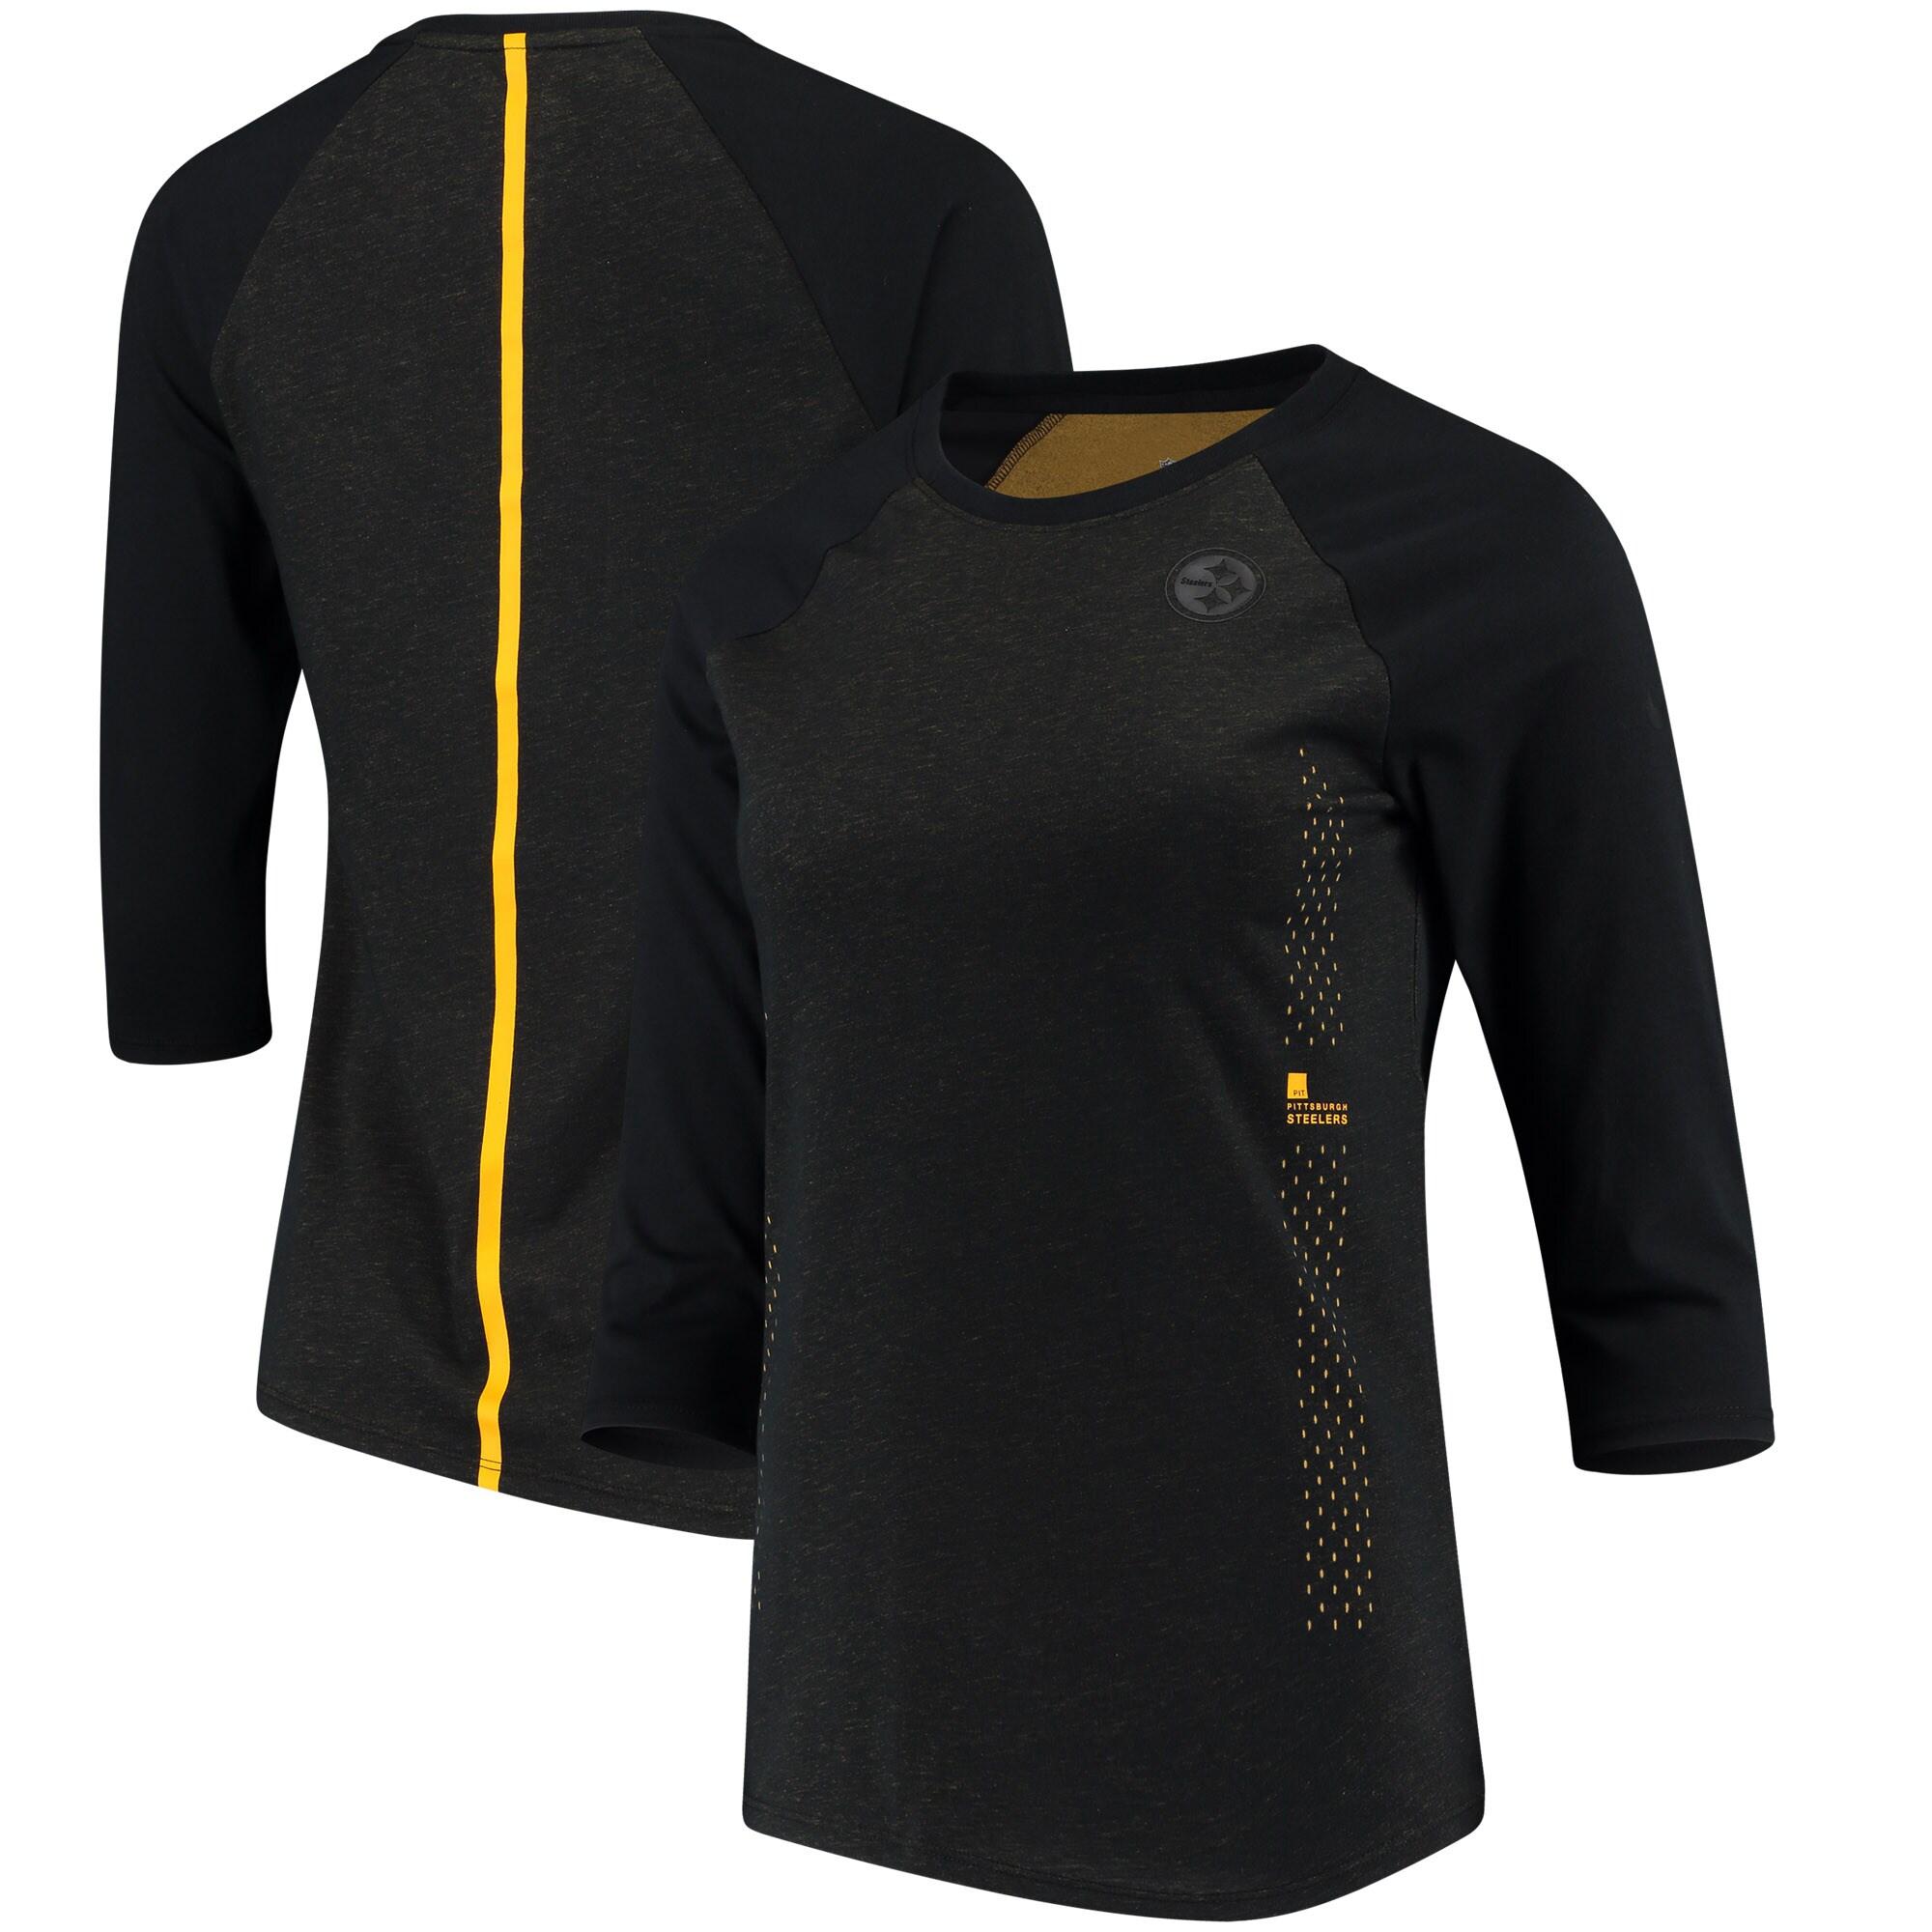 Pittsburgh Steelers Nike Women's Performance Black Pack 3/4 Sleeve Raglan T-Shirt - Black